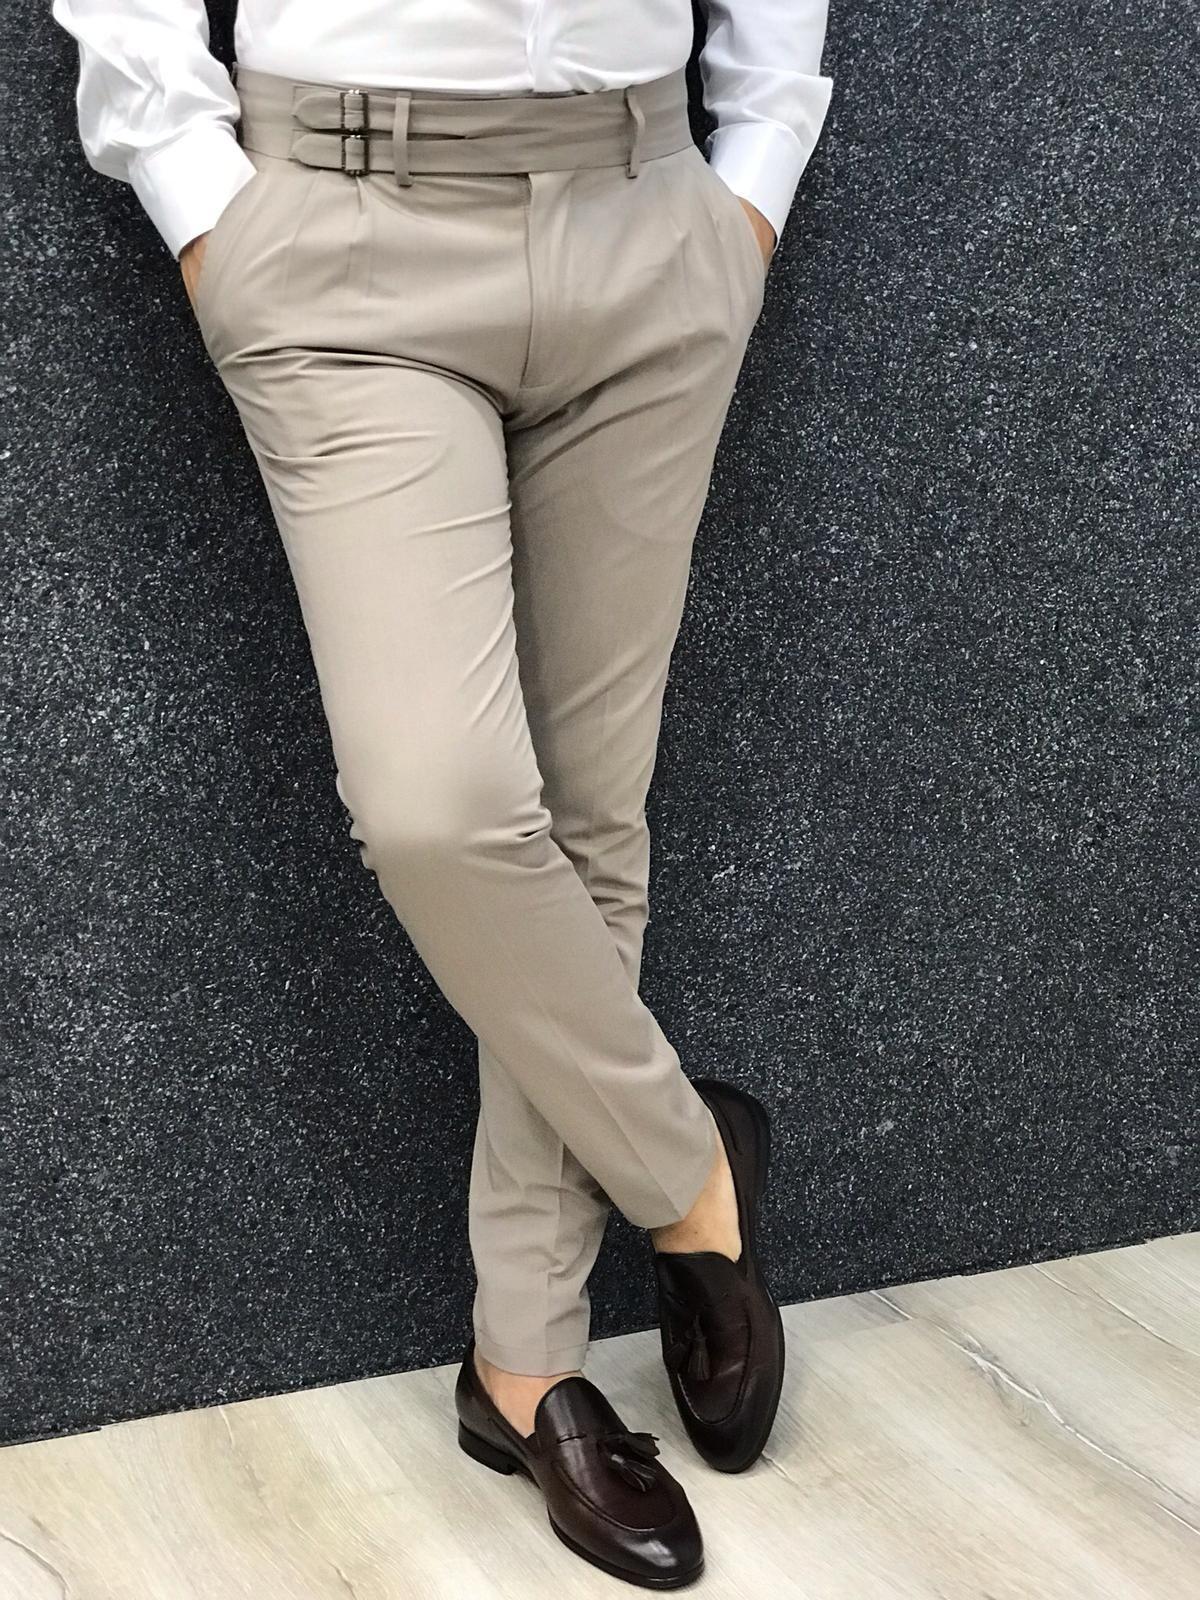 Miran Pants In 6 Colors Mens Pants Fashion Fashion Suits For Men Fashion Pants [ 1600 x 1200 Pixel ]